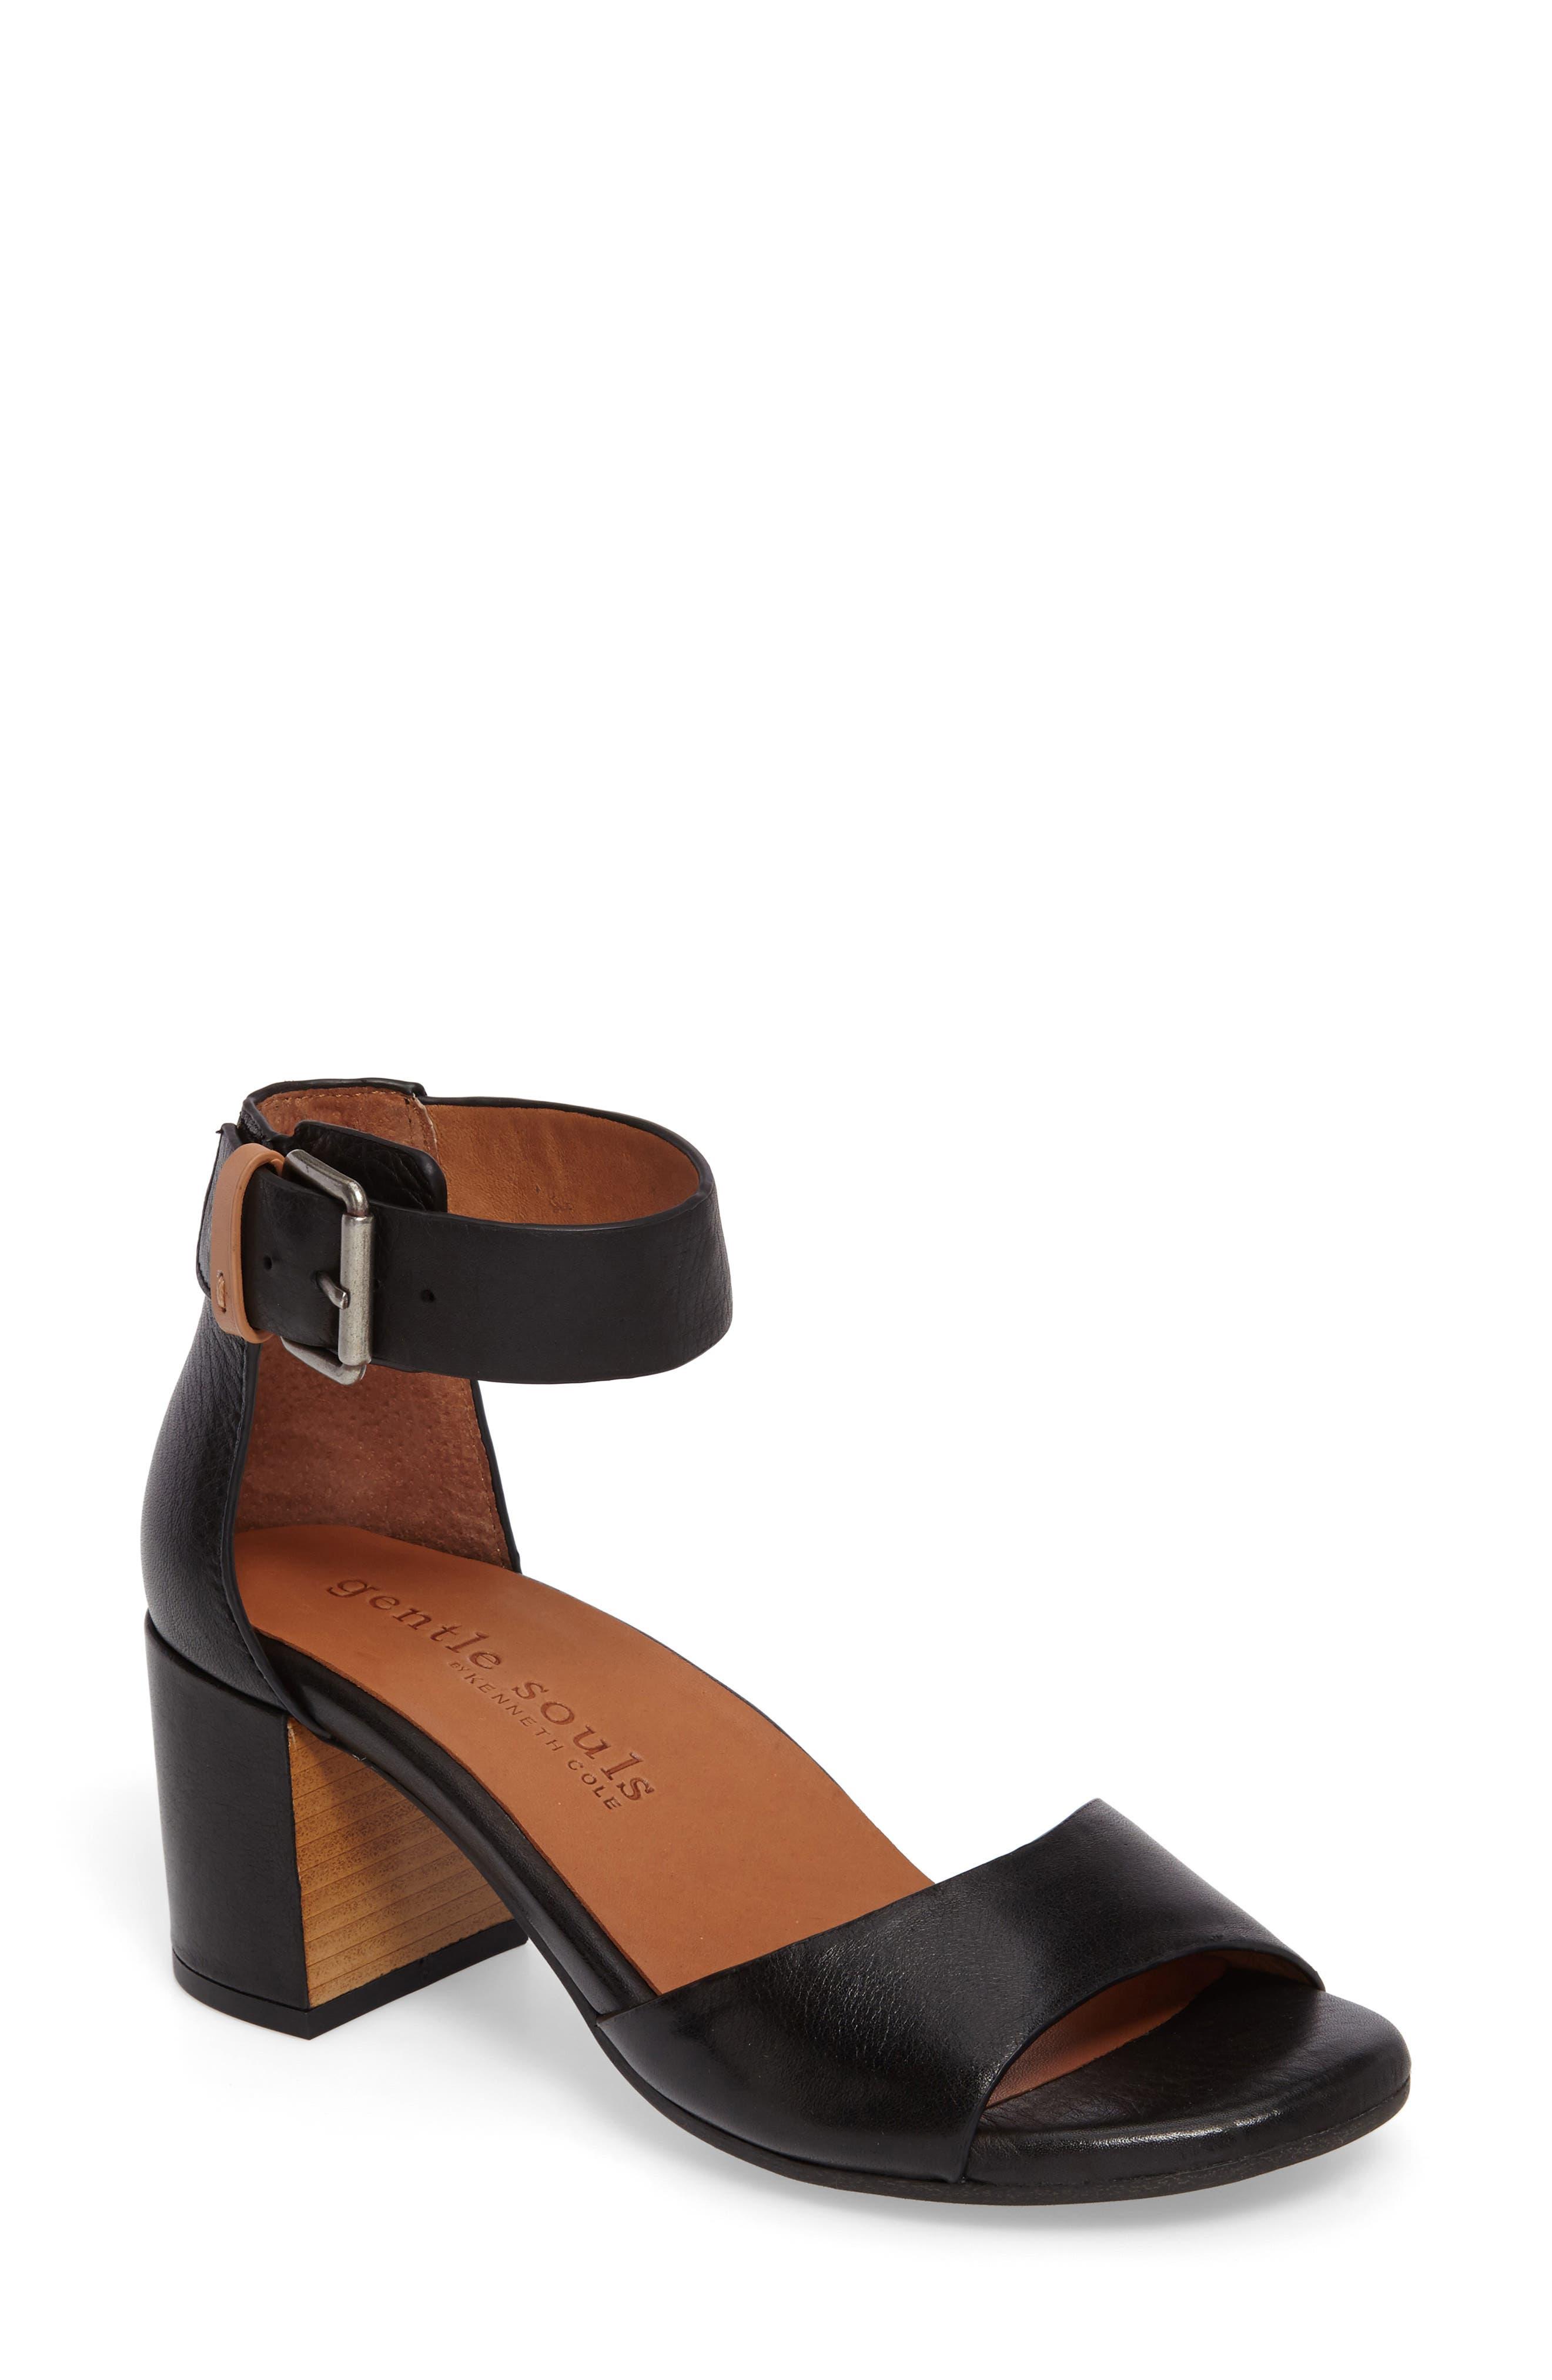 GENTLE SOULS BY KENNETH COLE Christa Block Heel Sandal, Main, color, BLACK LEATHER